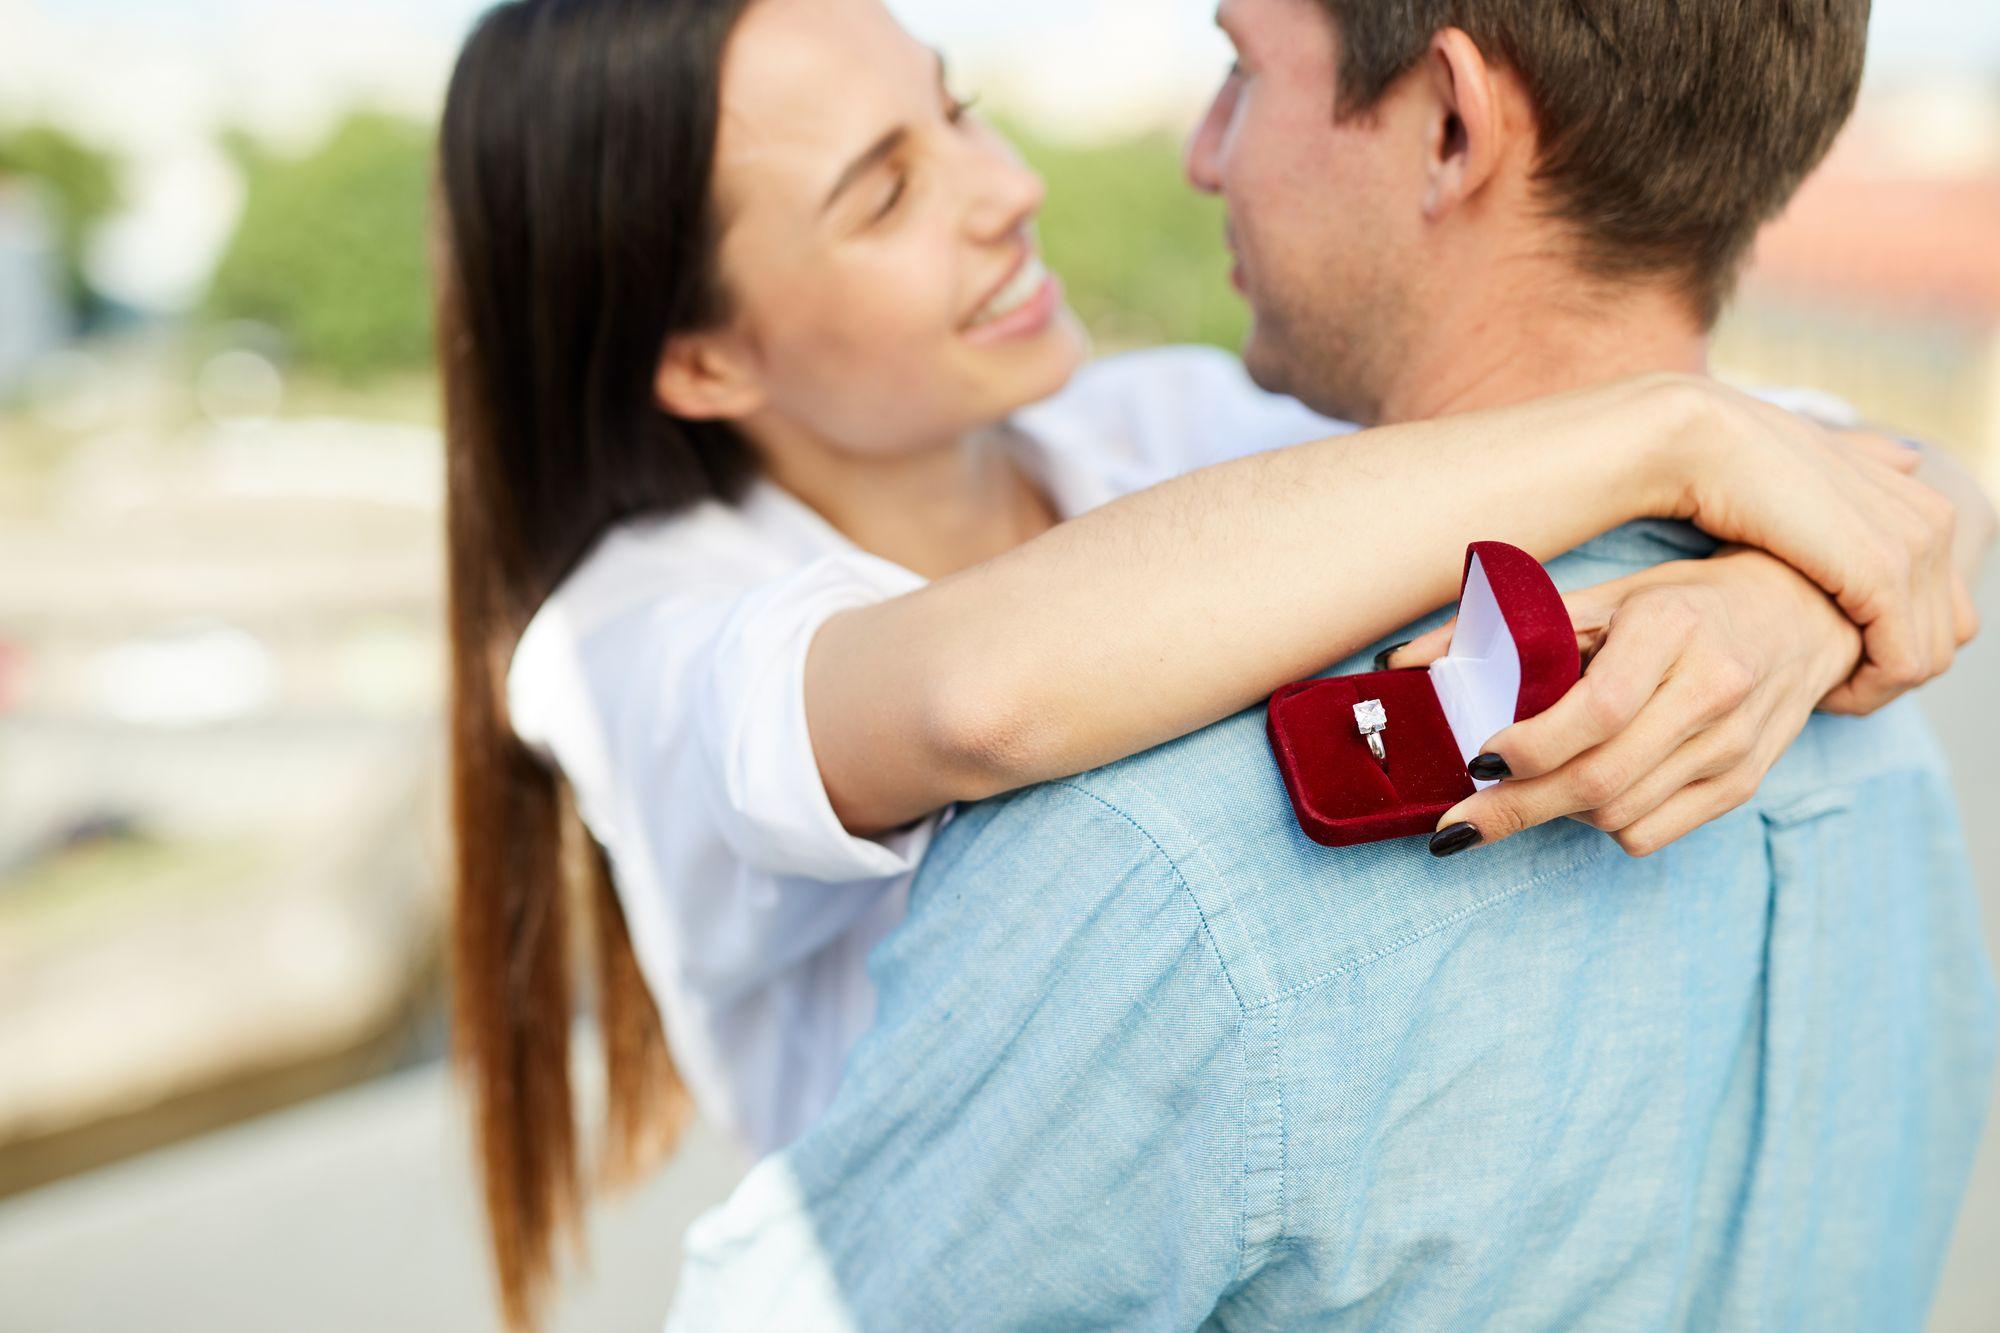 Mann und Frau umarmen sich nach Heiratsantrag